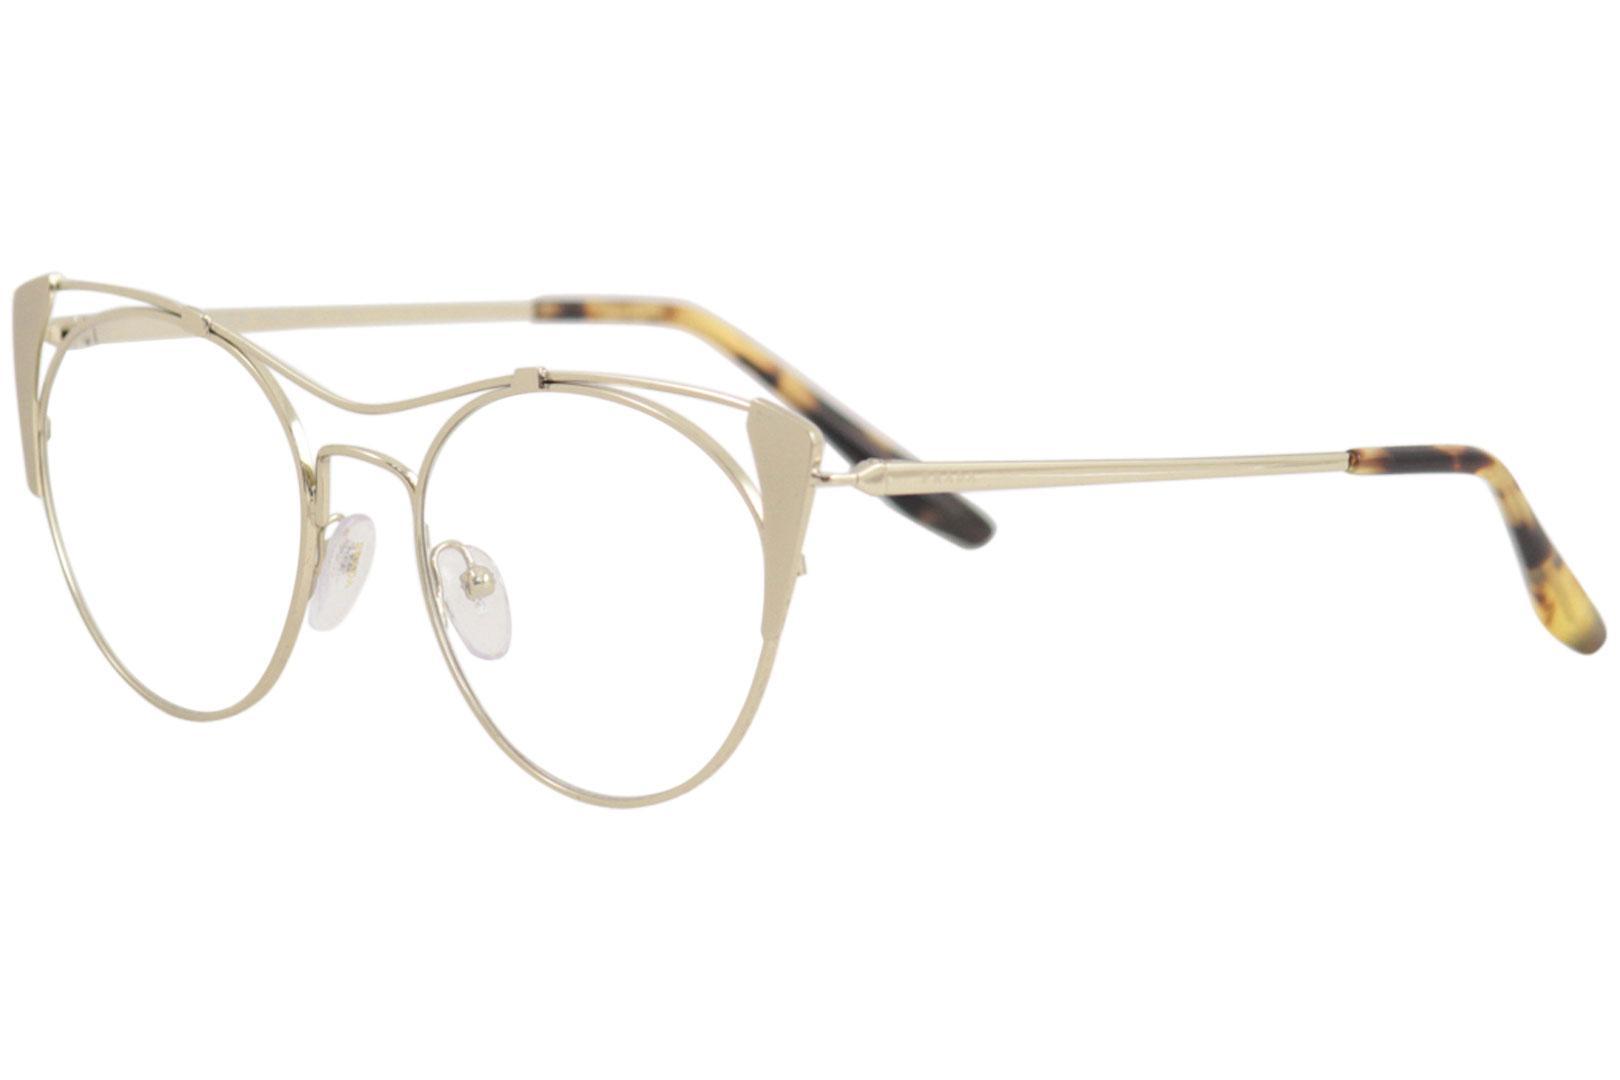 264e9f90362 Prada Eyeglasses VPR58V VPR 58 V 331 1O1 Matte Pale Gold Optical ...